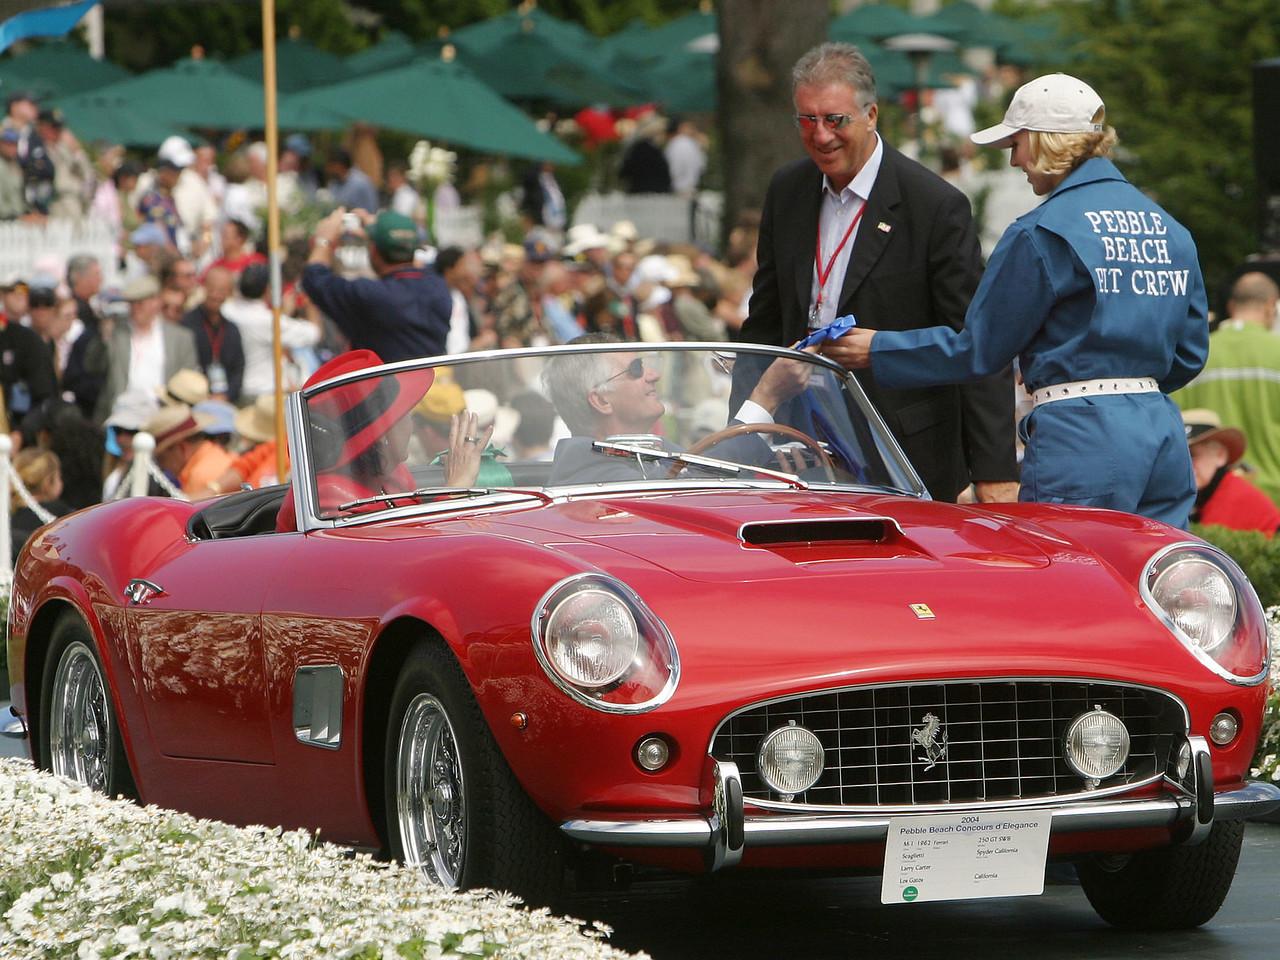 1962 Ferrari 250 GT SWB Scaglietti Spyder California. 1st Ferrari Open.  Larry Carter.